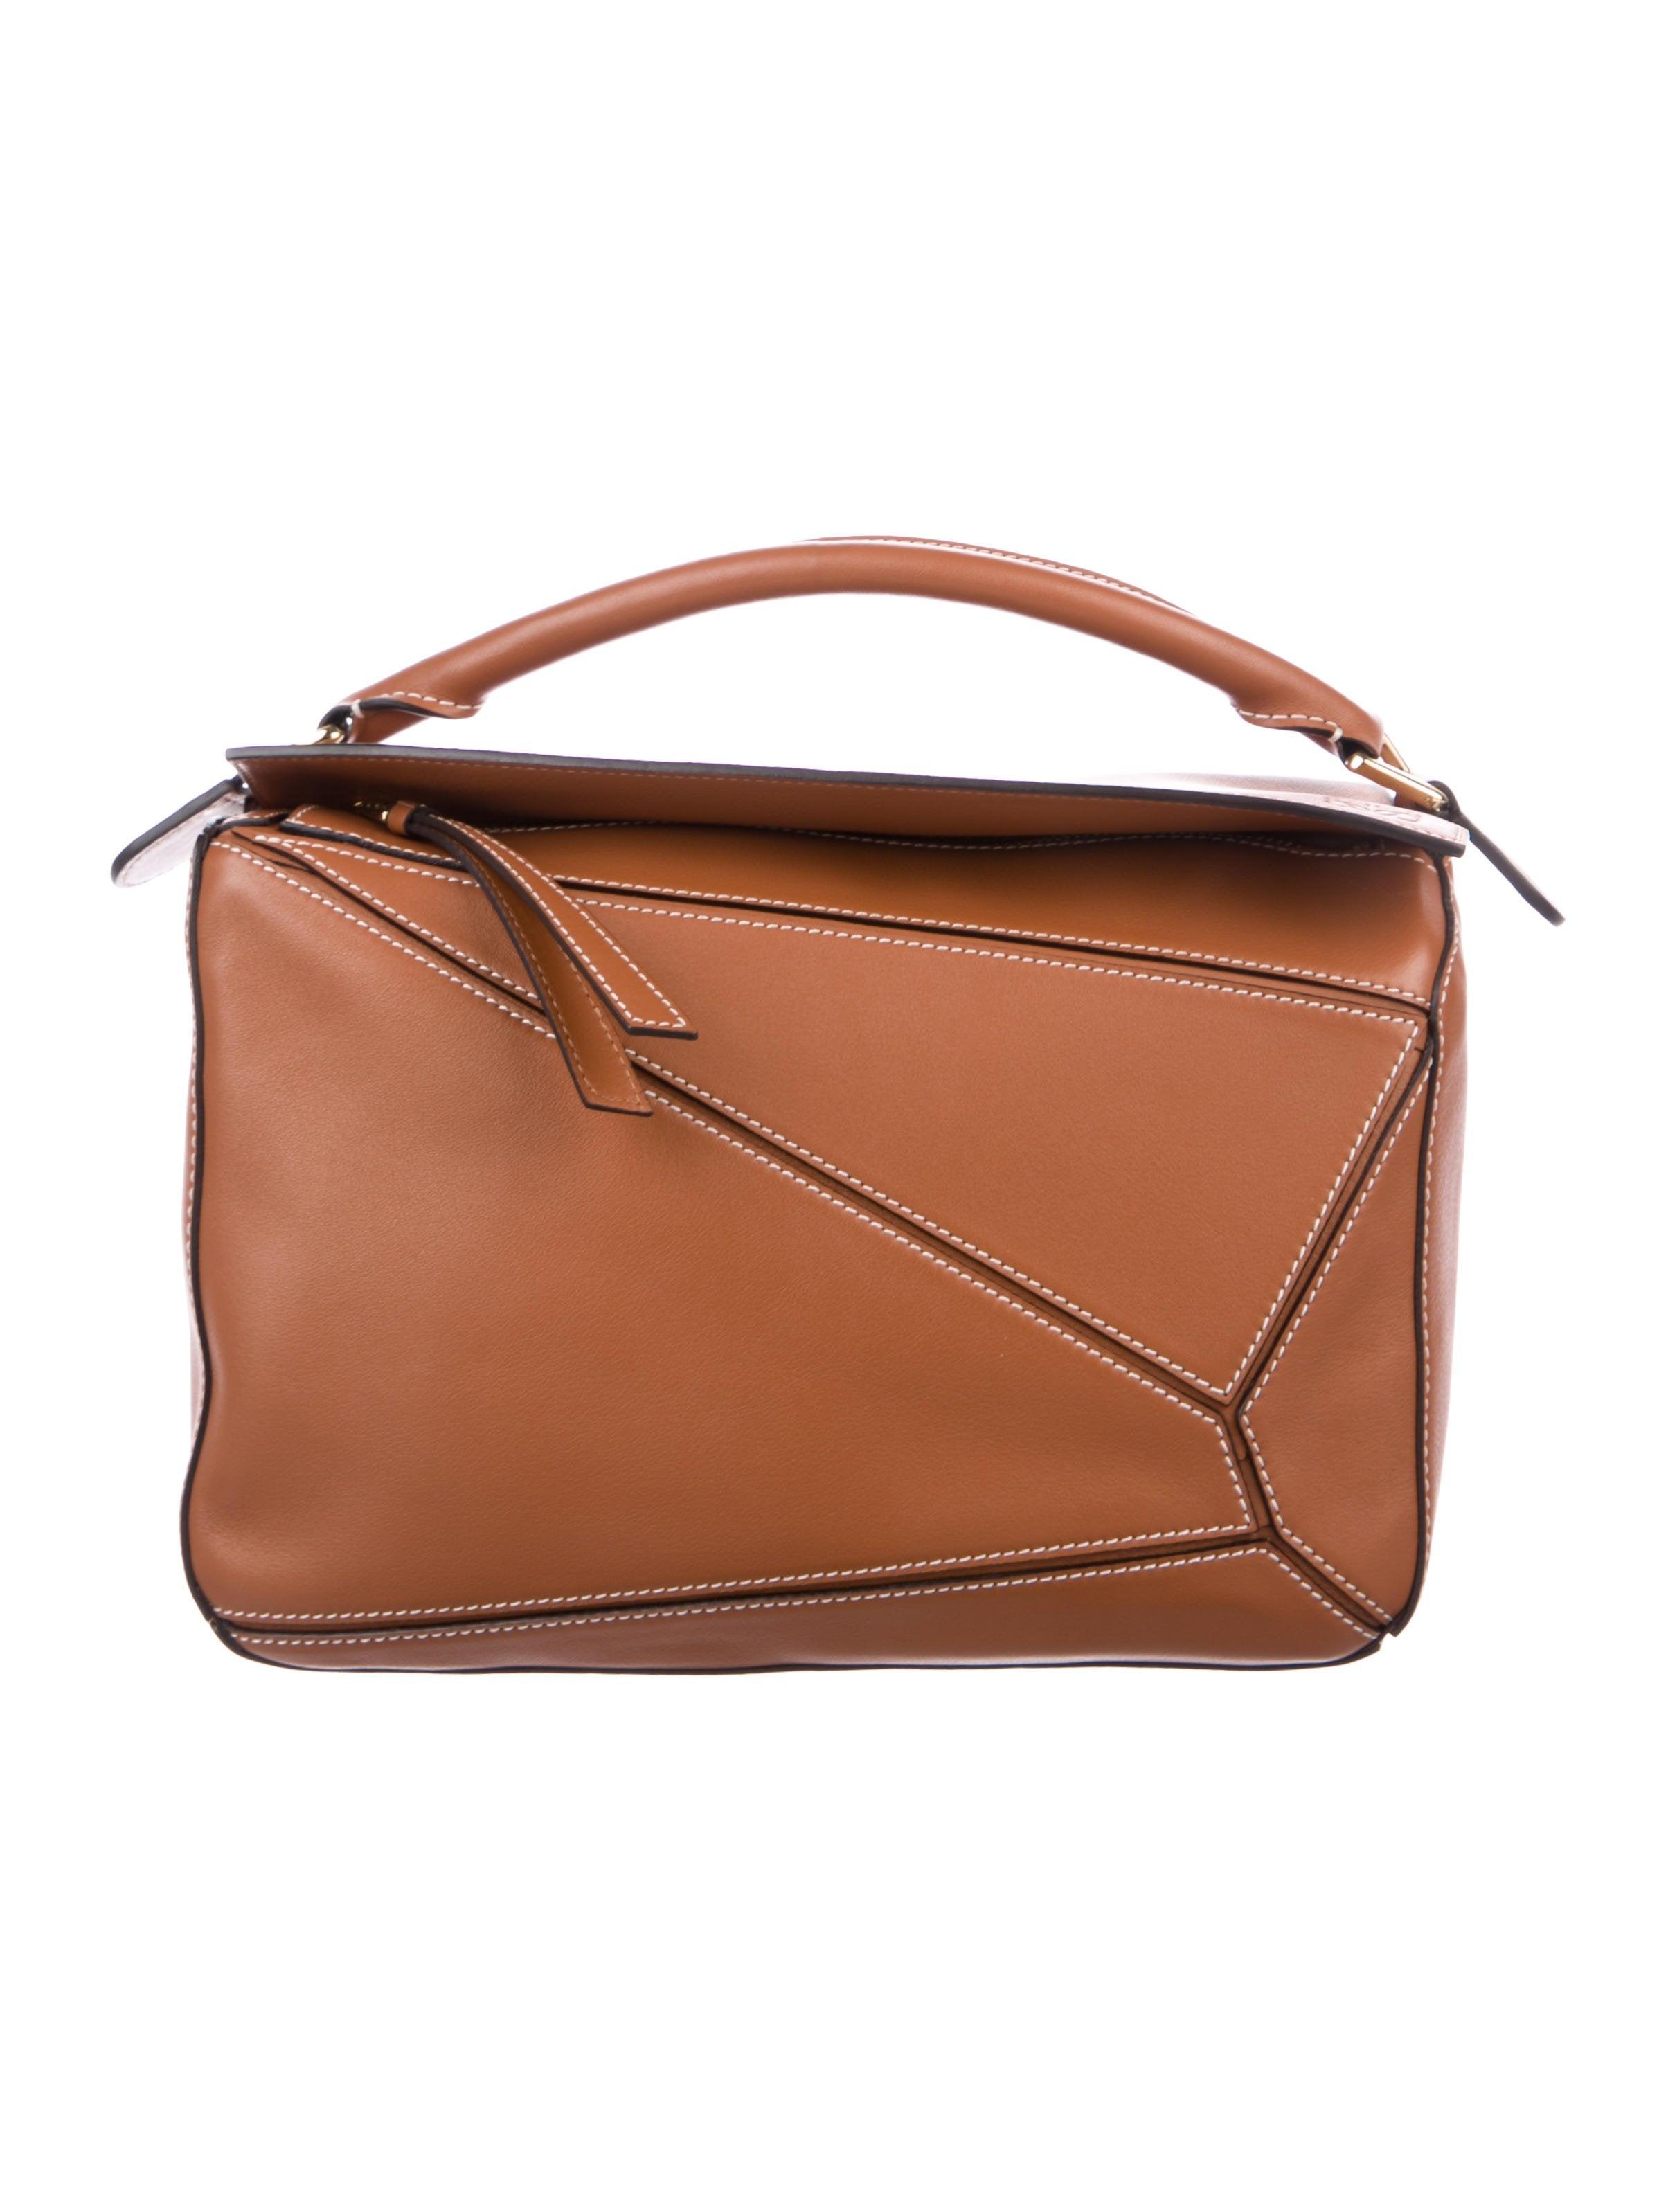 4114d9c8c51 Handbags